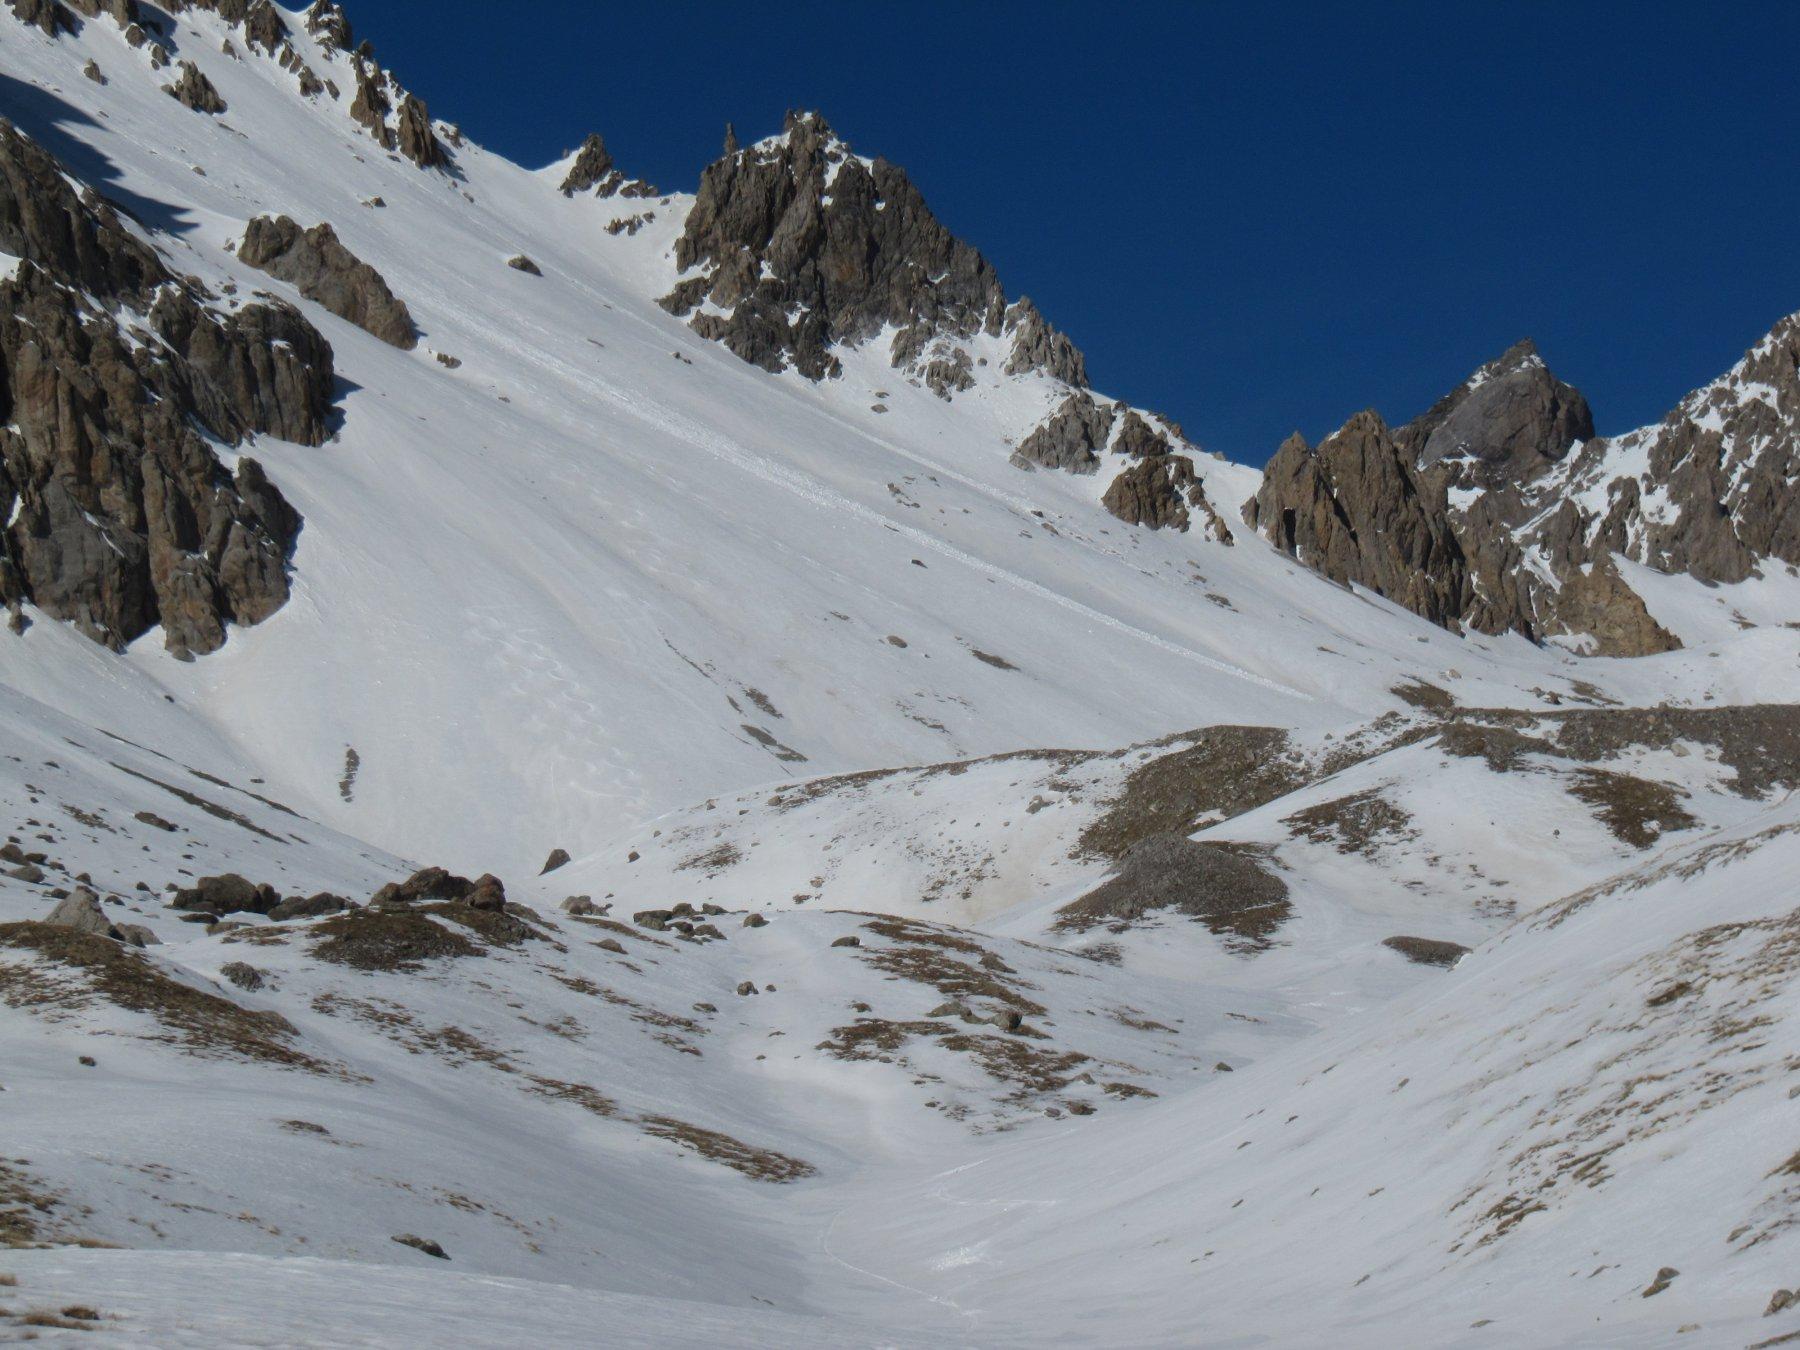 Bellissima neve trasformata